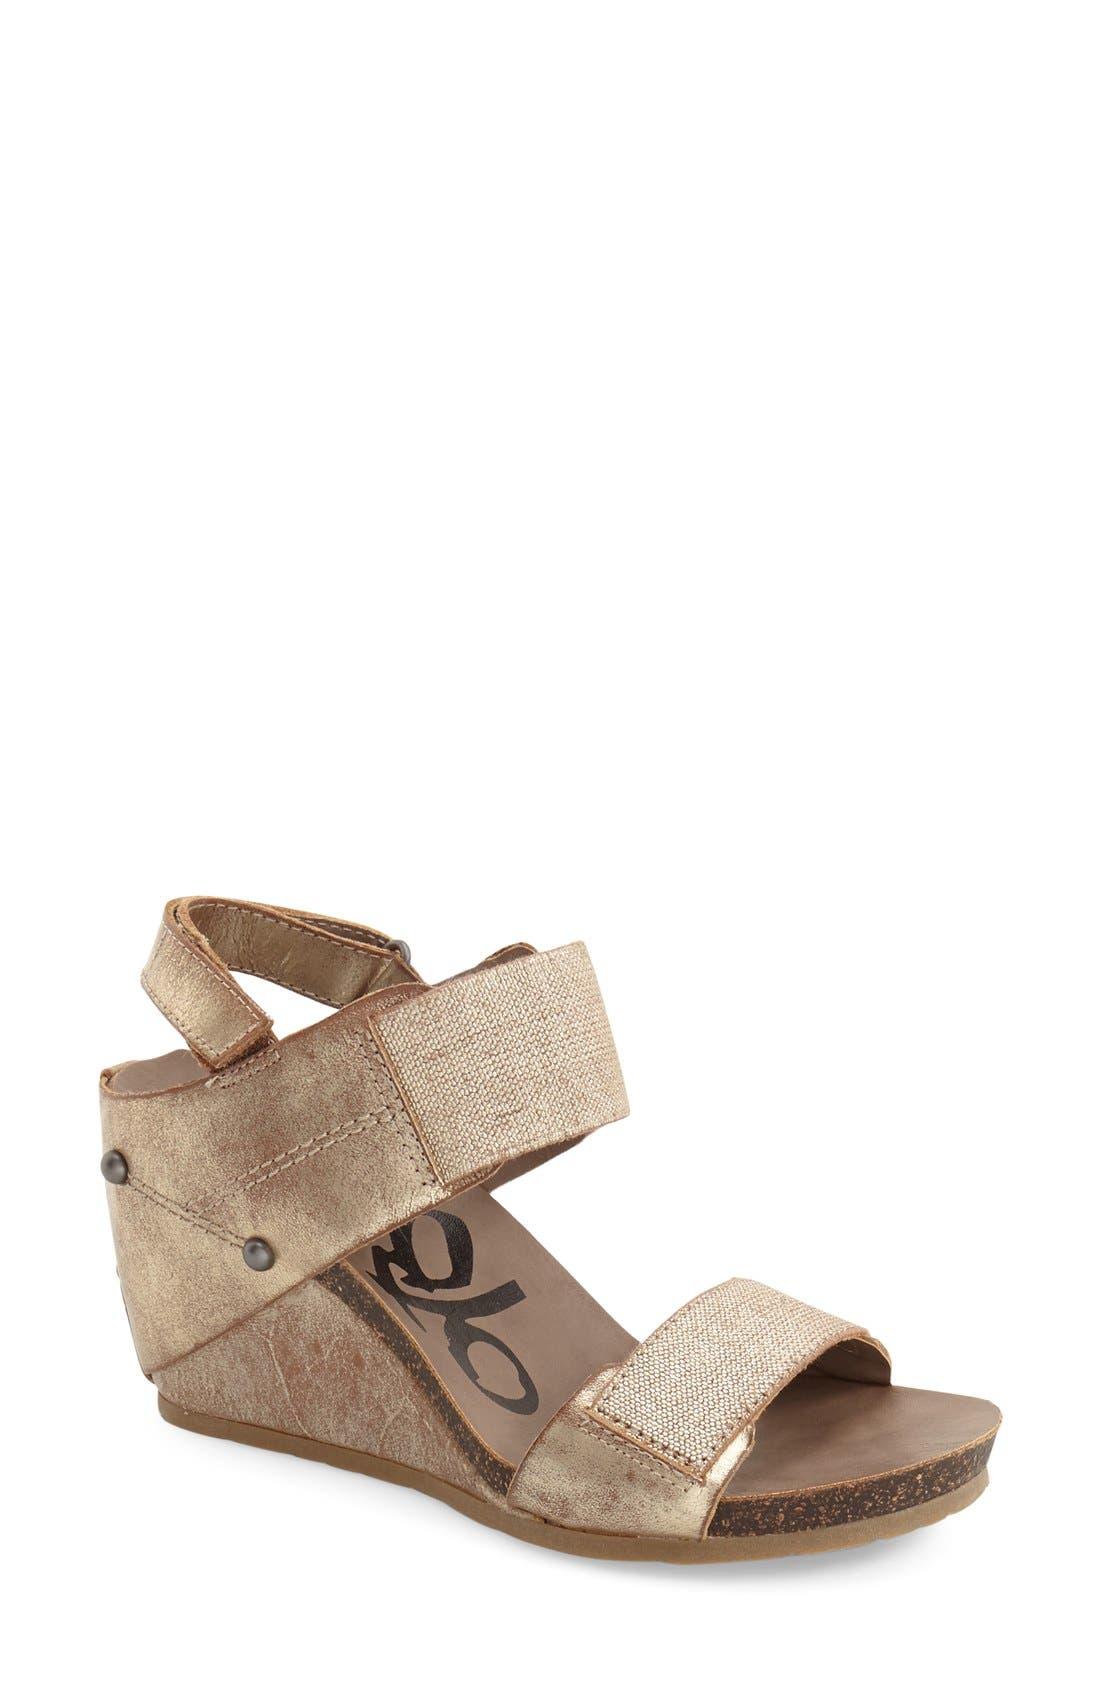 Main Image - OTBT 'Trailblazer' Wedge Sandal (Women)